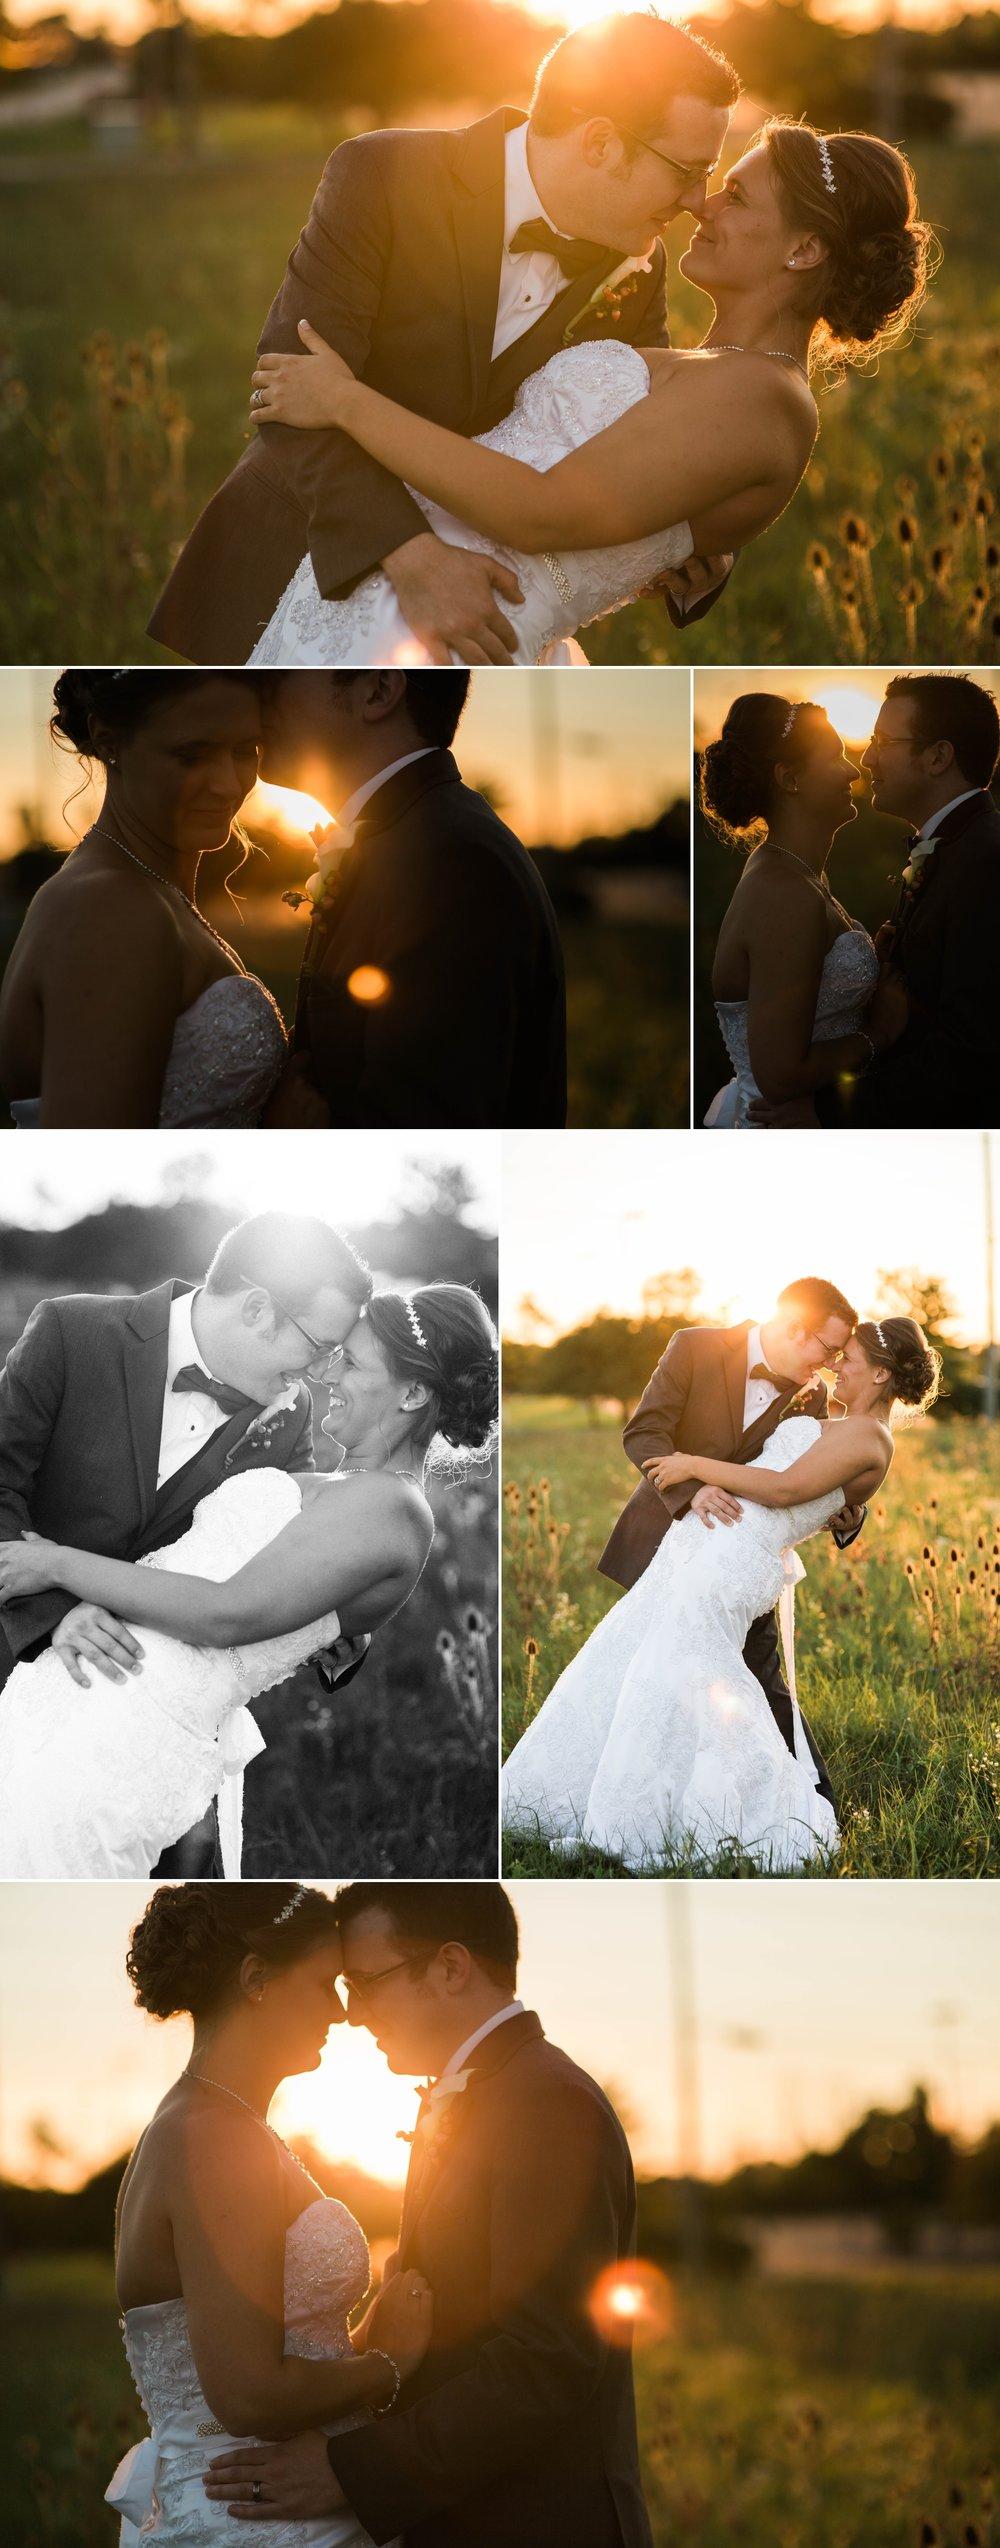 fort wayne-indiana-wedding-bride-groom-ceremony-wedding day-love-ceruti's-morgan ruth photography